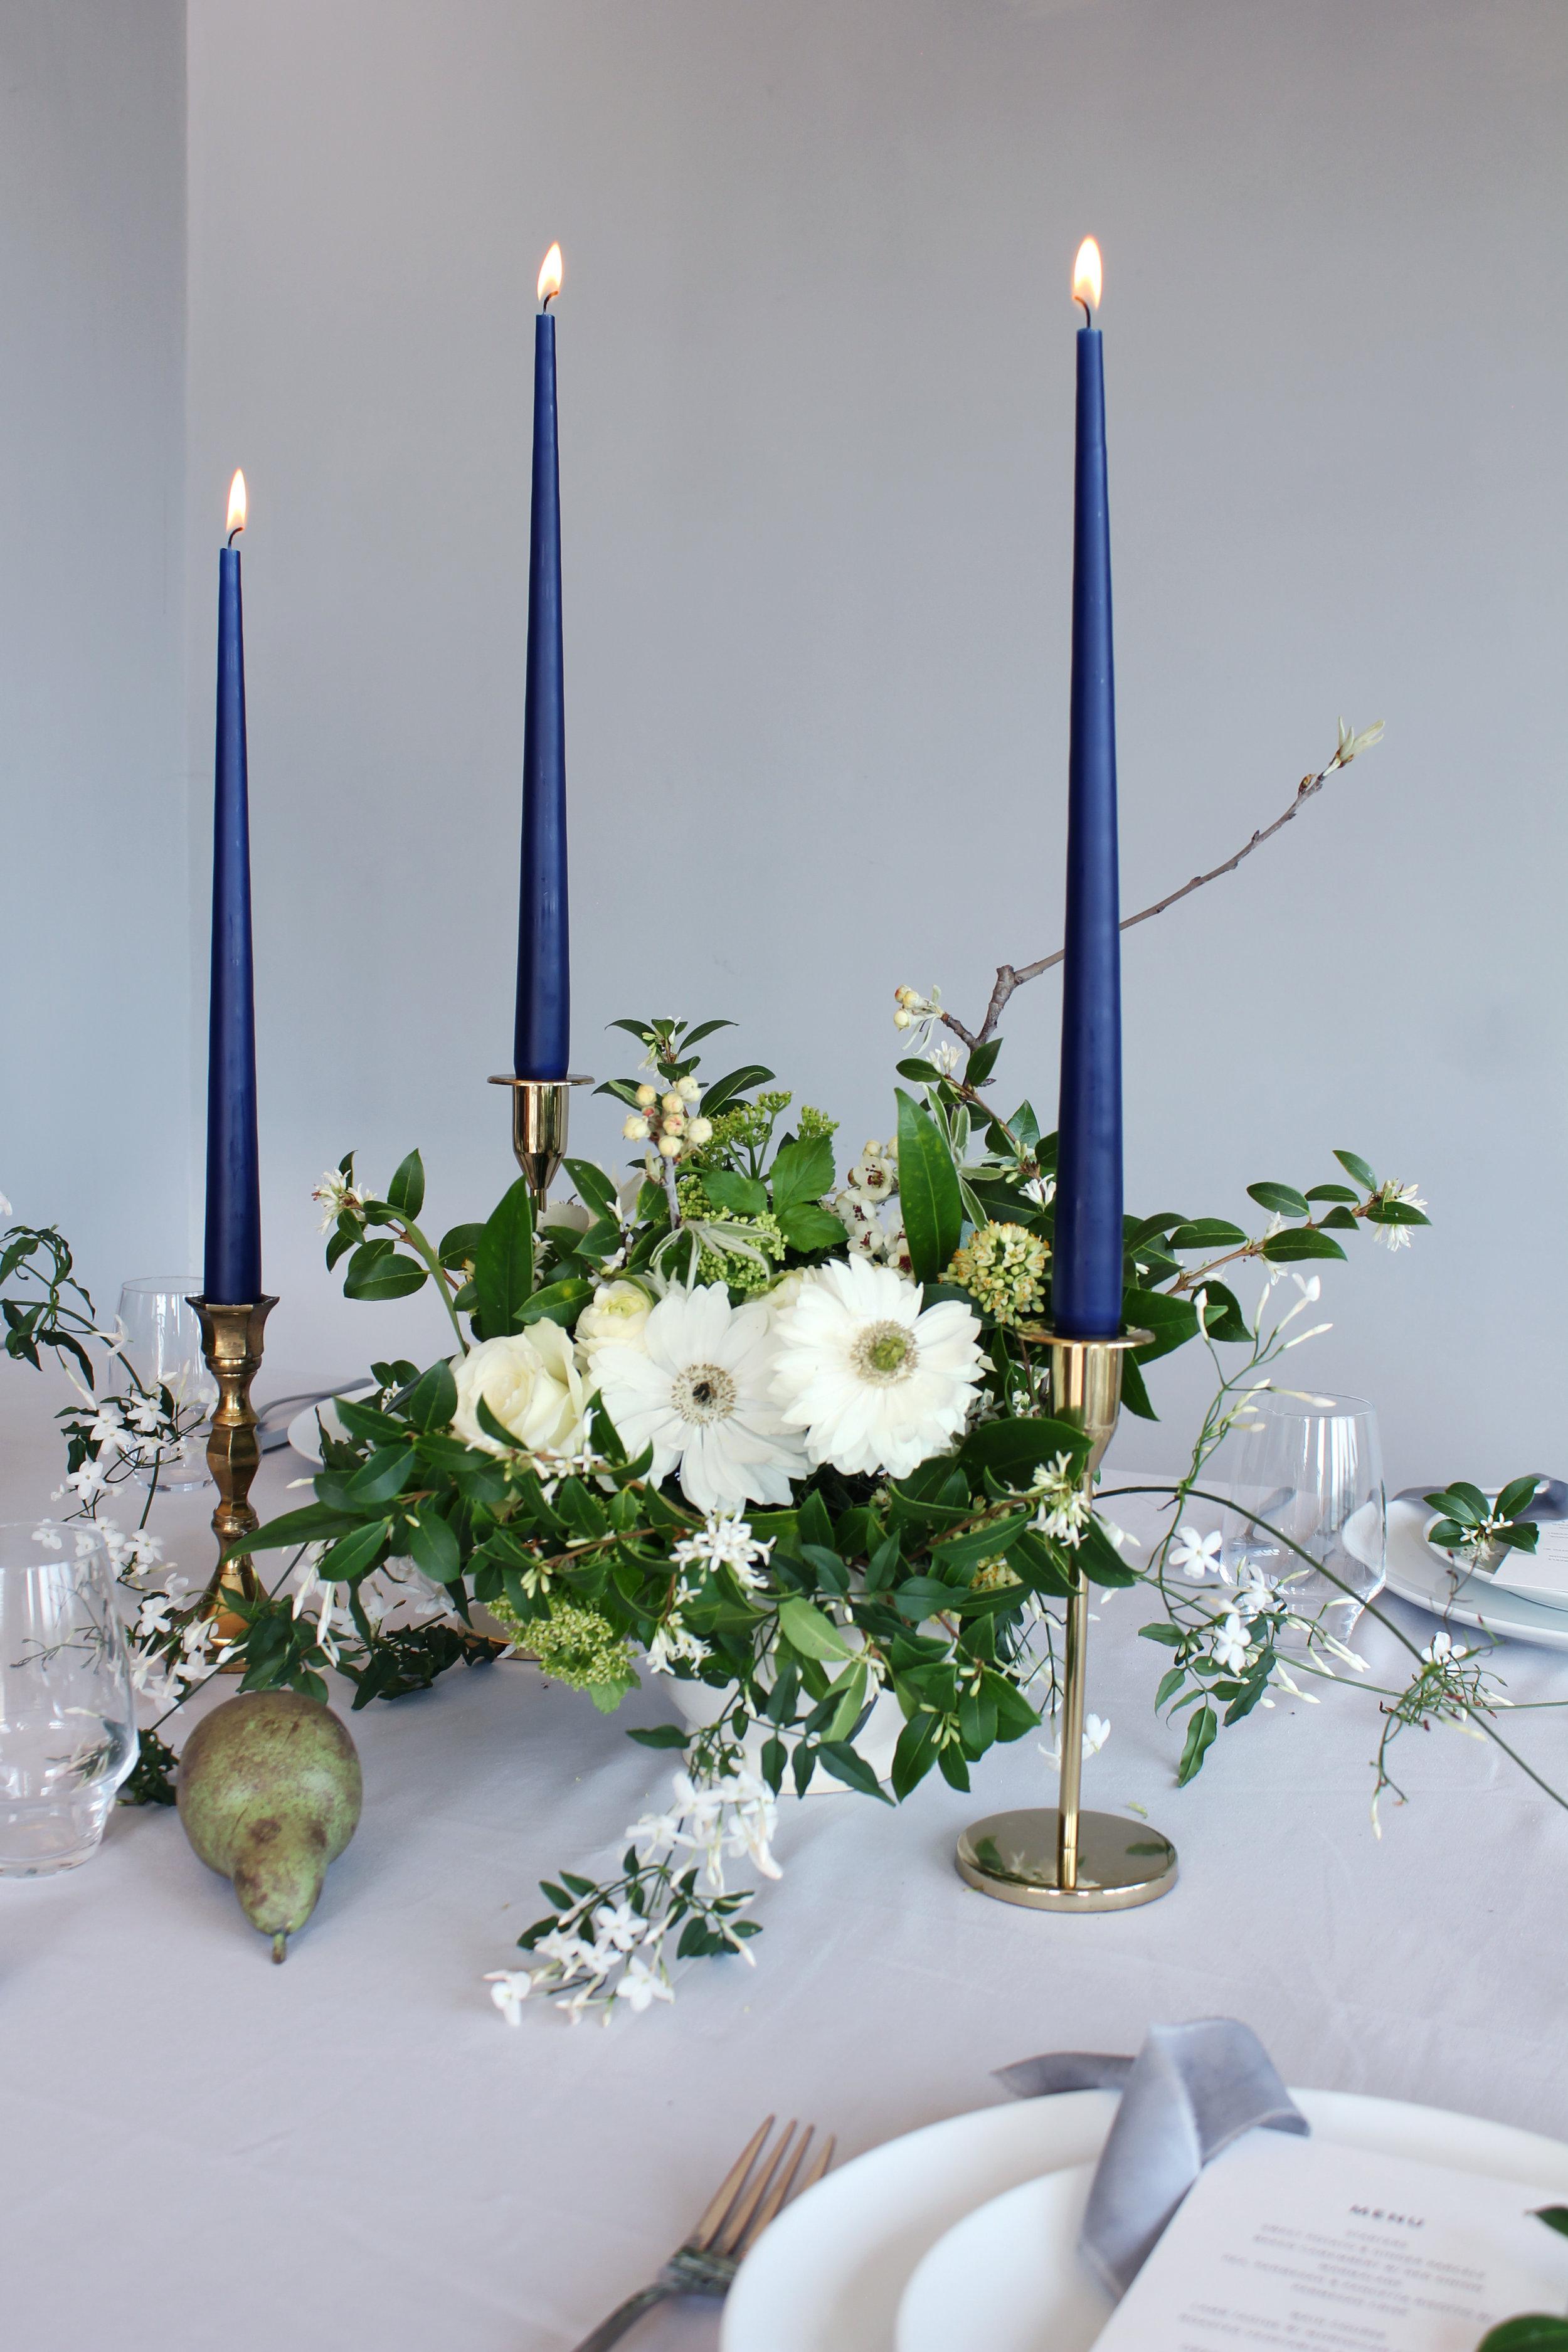 Callie-Pettigrew-Dusky-Blue-Wedding-1.jpg